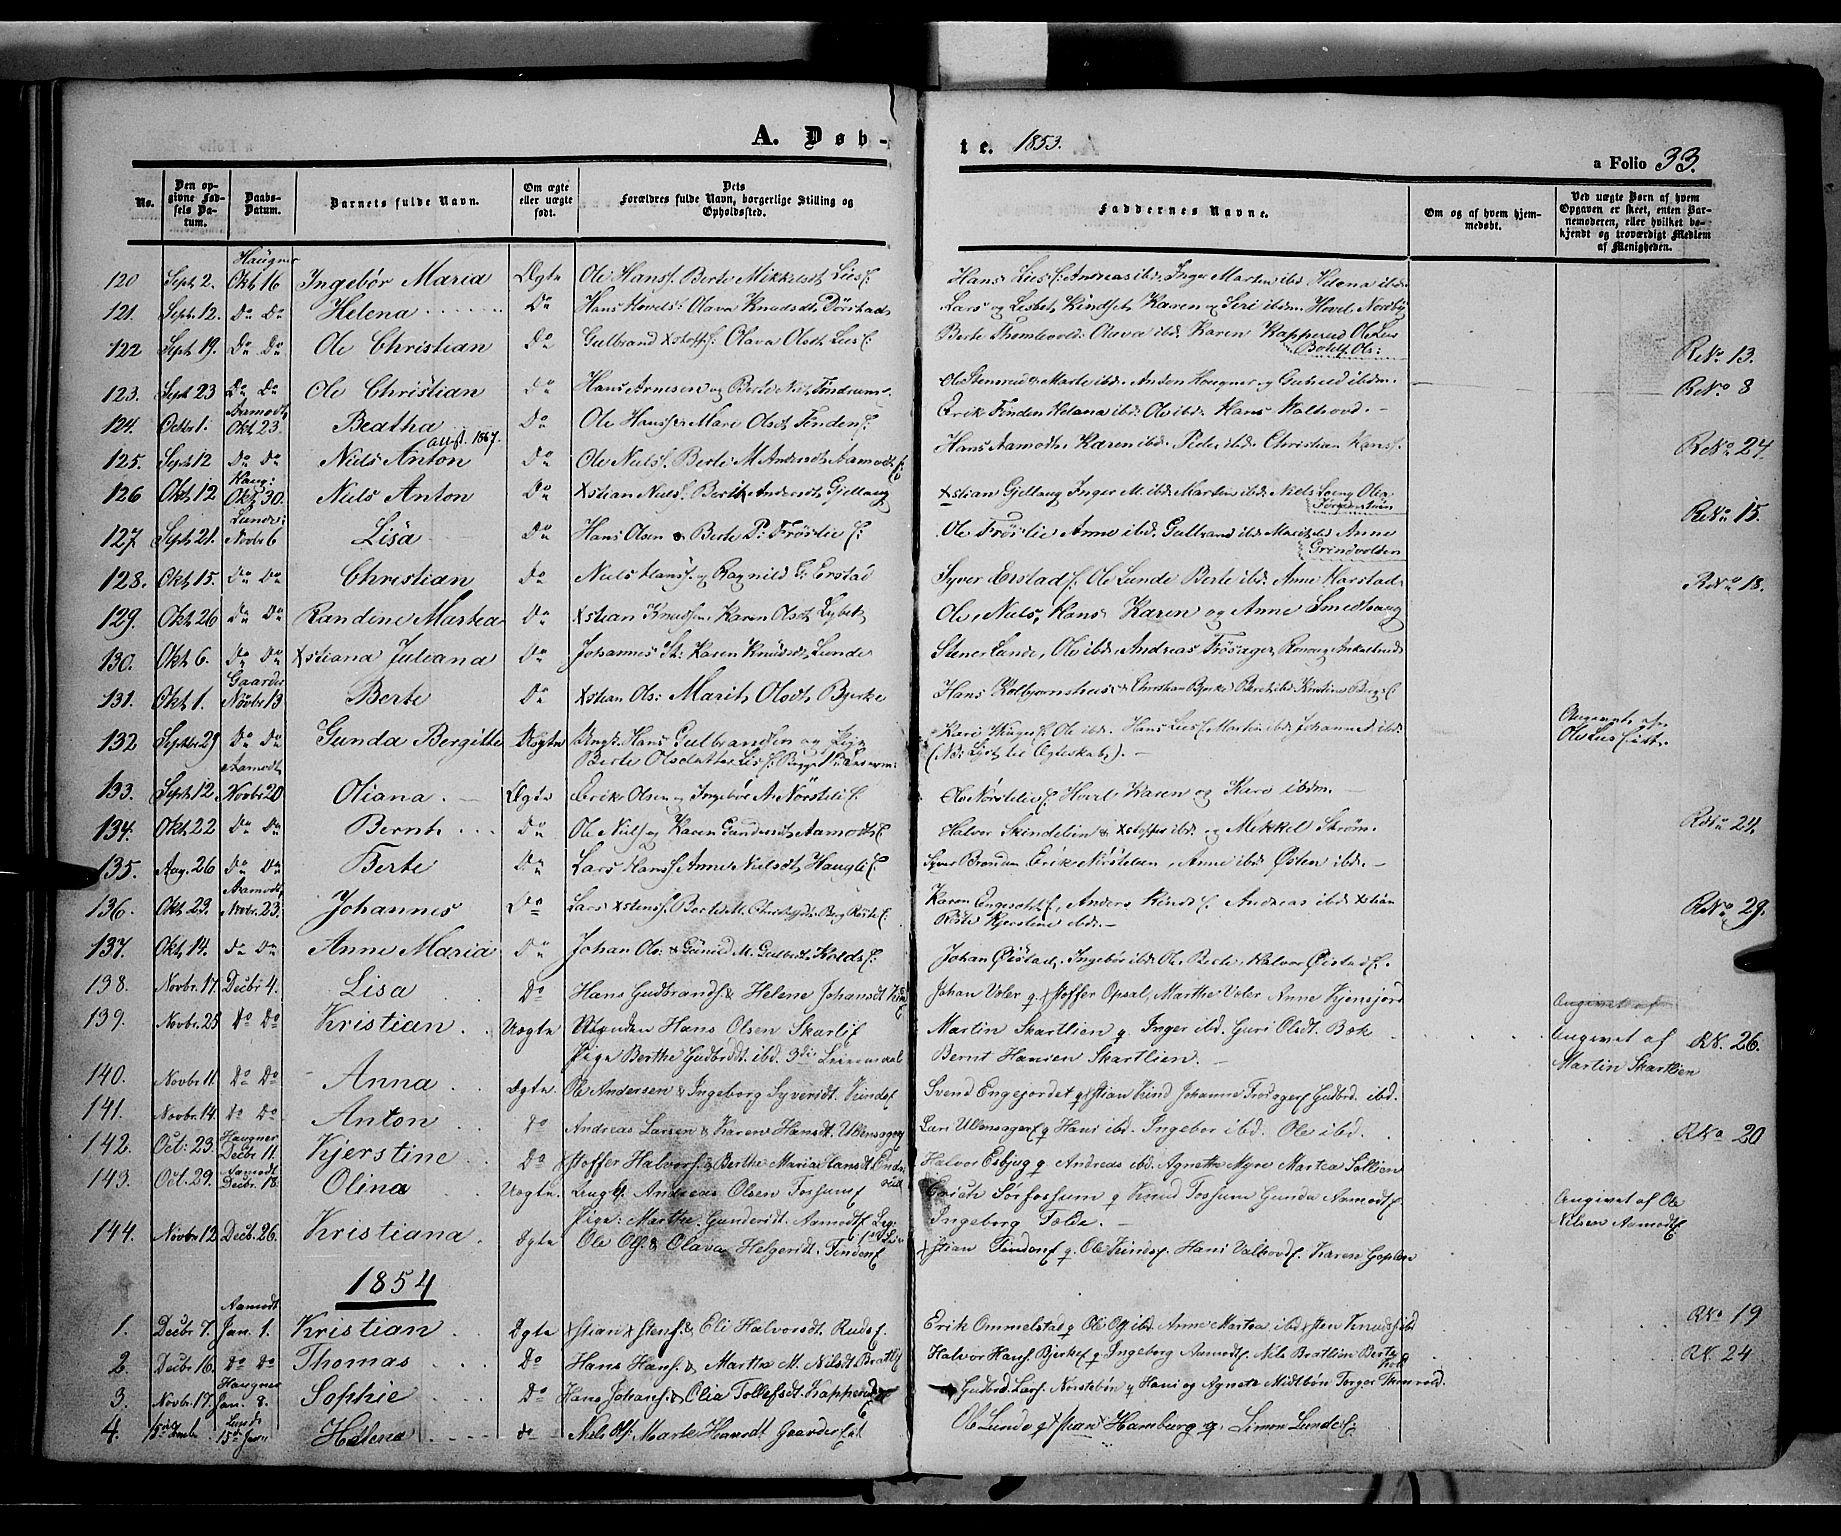 SAH, Land prestekontor, Ministerialbok nr. 10, 1847-1859, s. 33